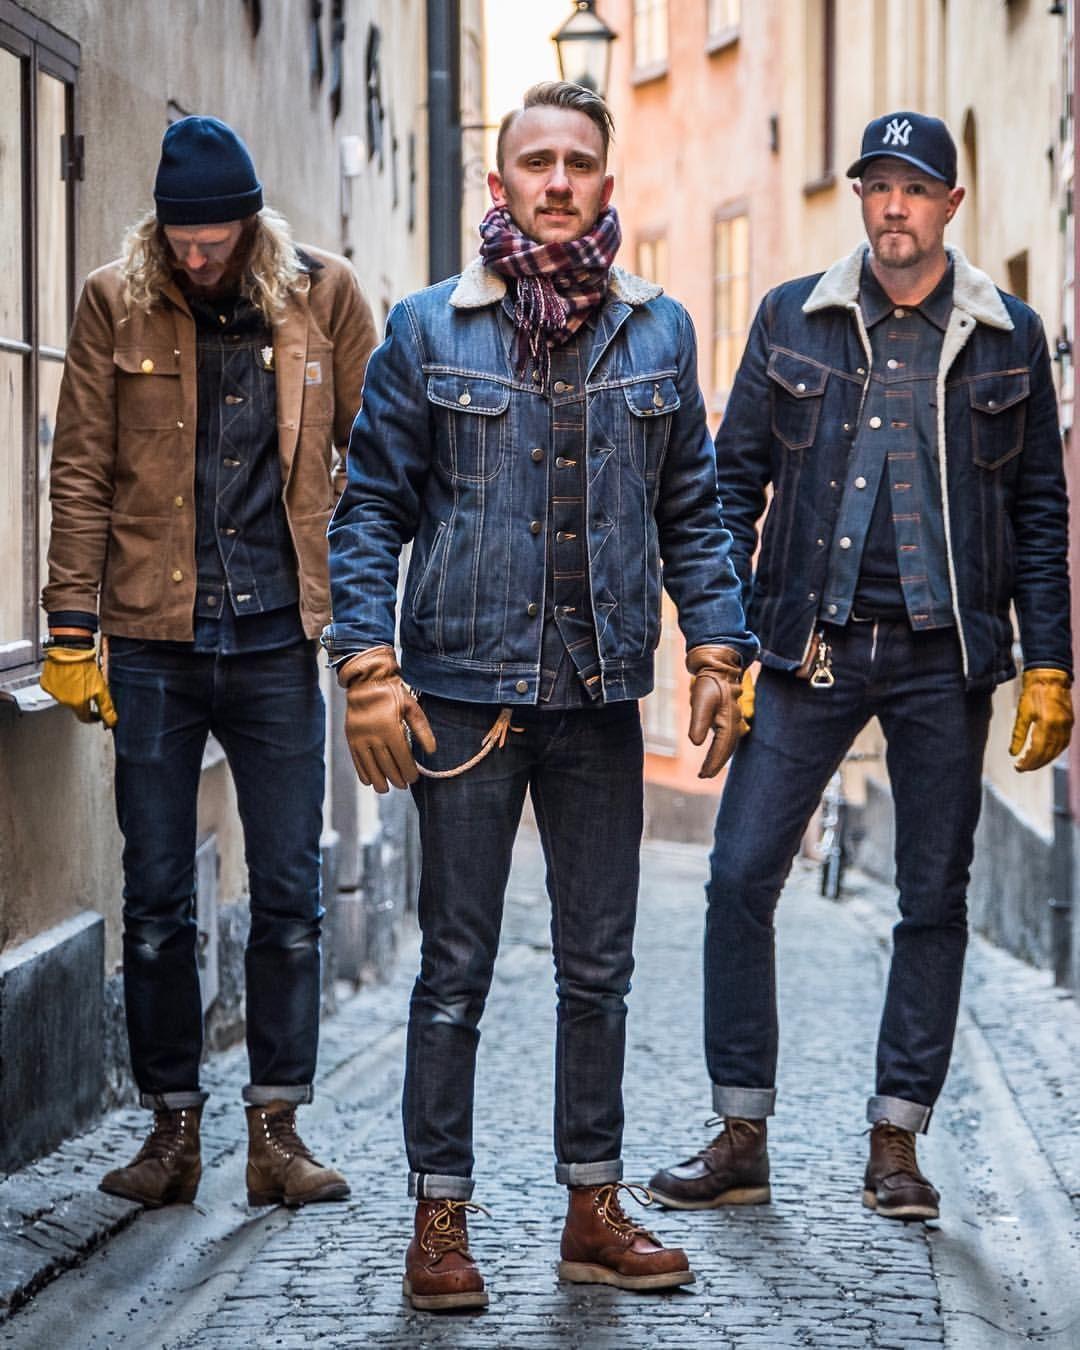 Denim Jacket Men Mens Fashion Rugged Mens Fashion Denim Denim Fashion Mens Fashion Casual Fashion Danie Mens Fashion Denim Denim Outfit Men Mens Outfits